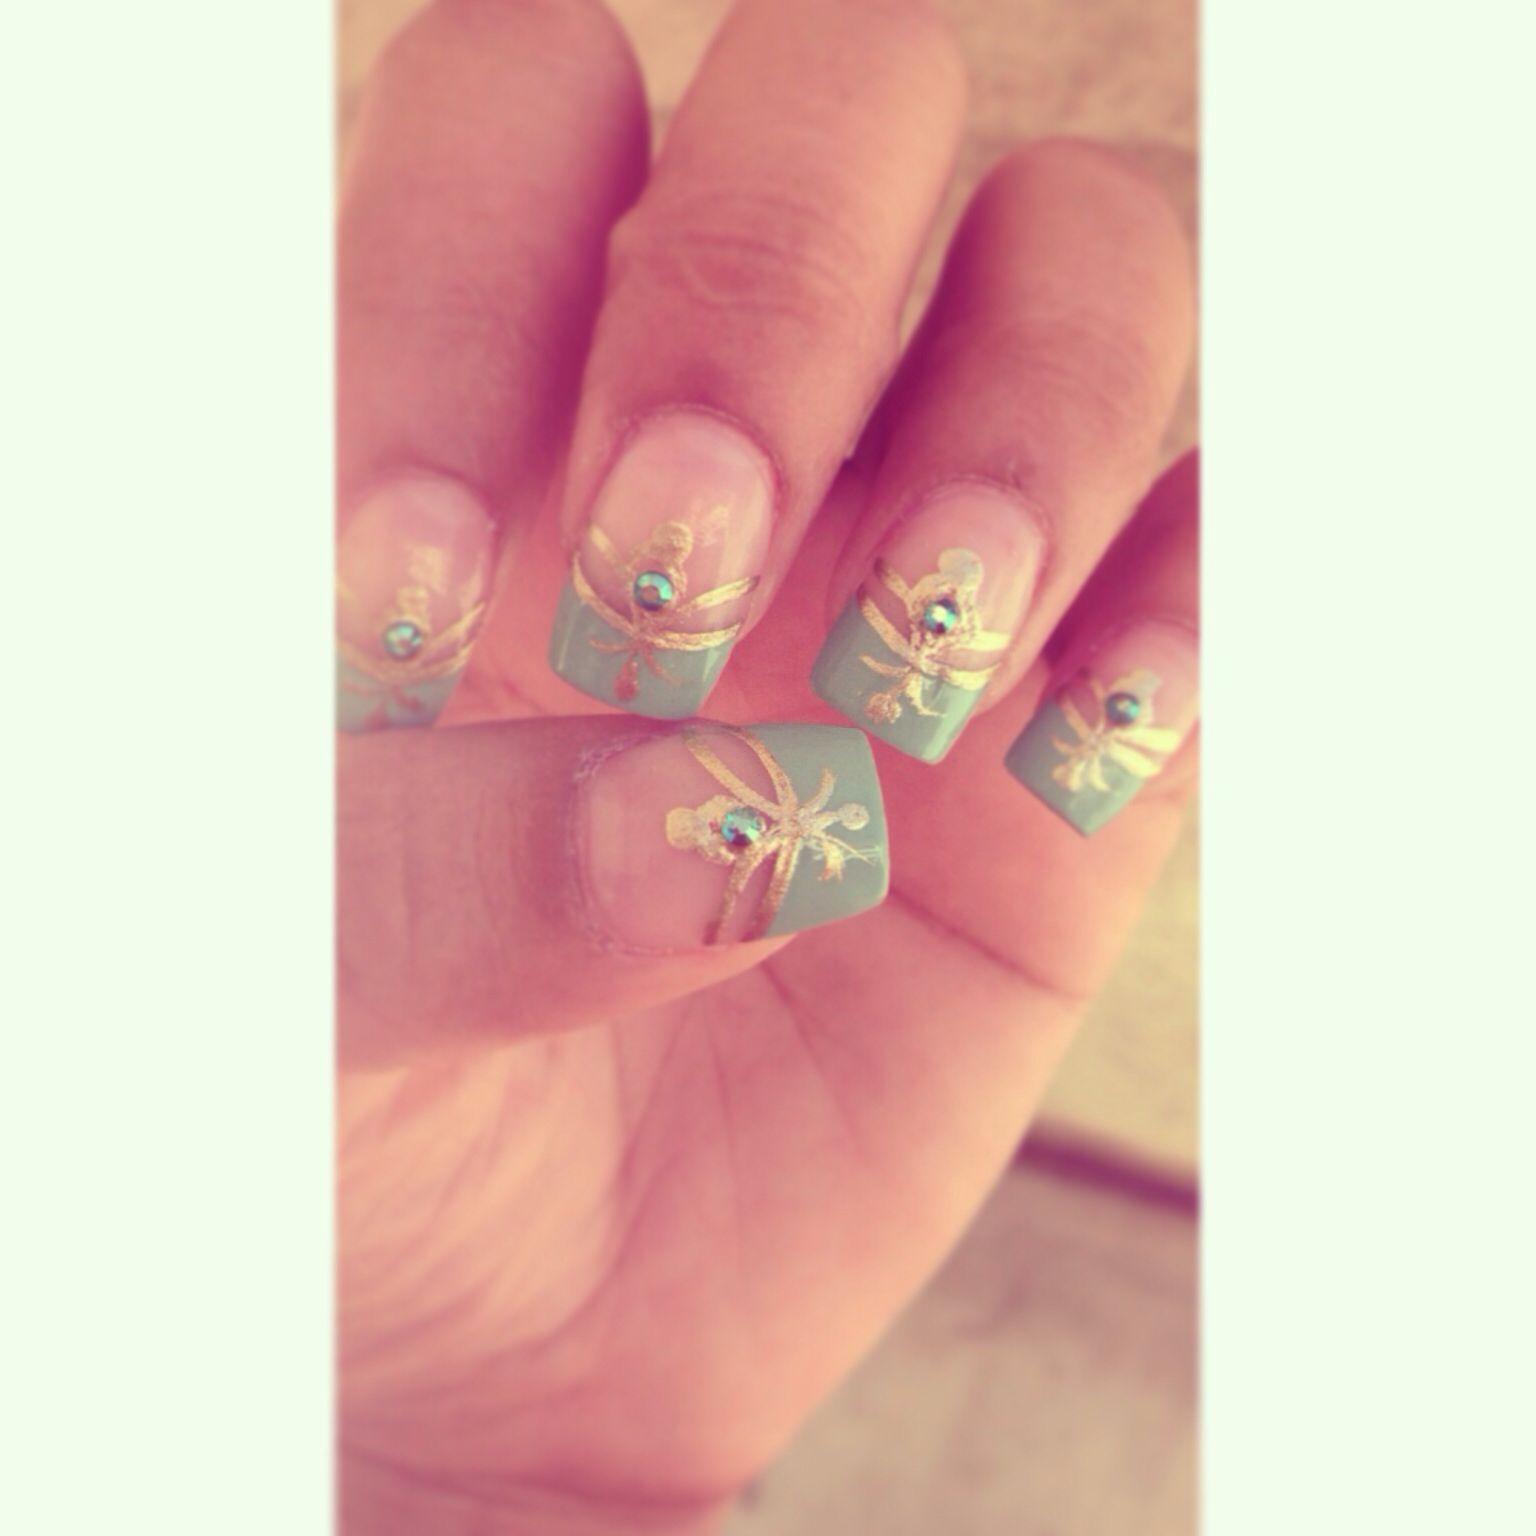 Princess jasmine nails #disney #nails | nails | Pinterest